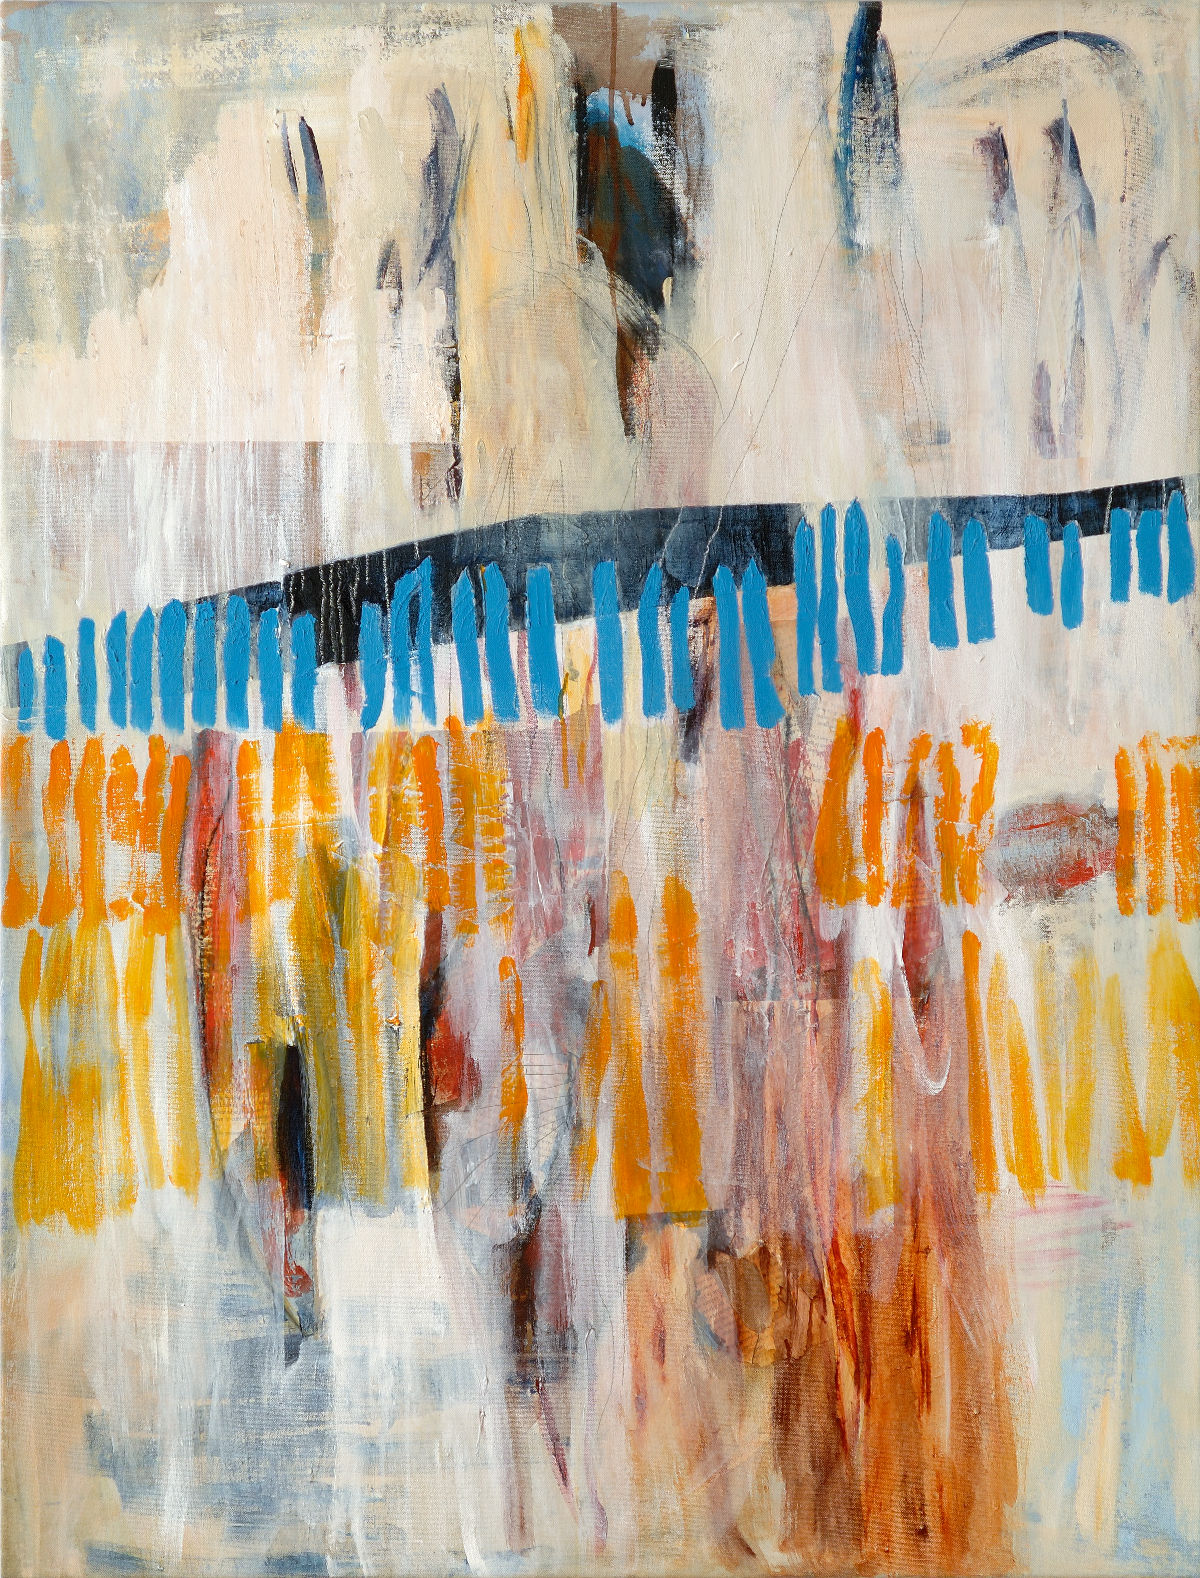 Papier kraft au piano, 2008